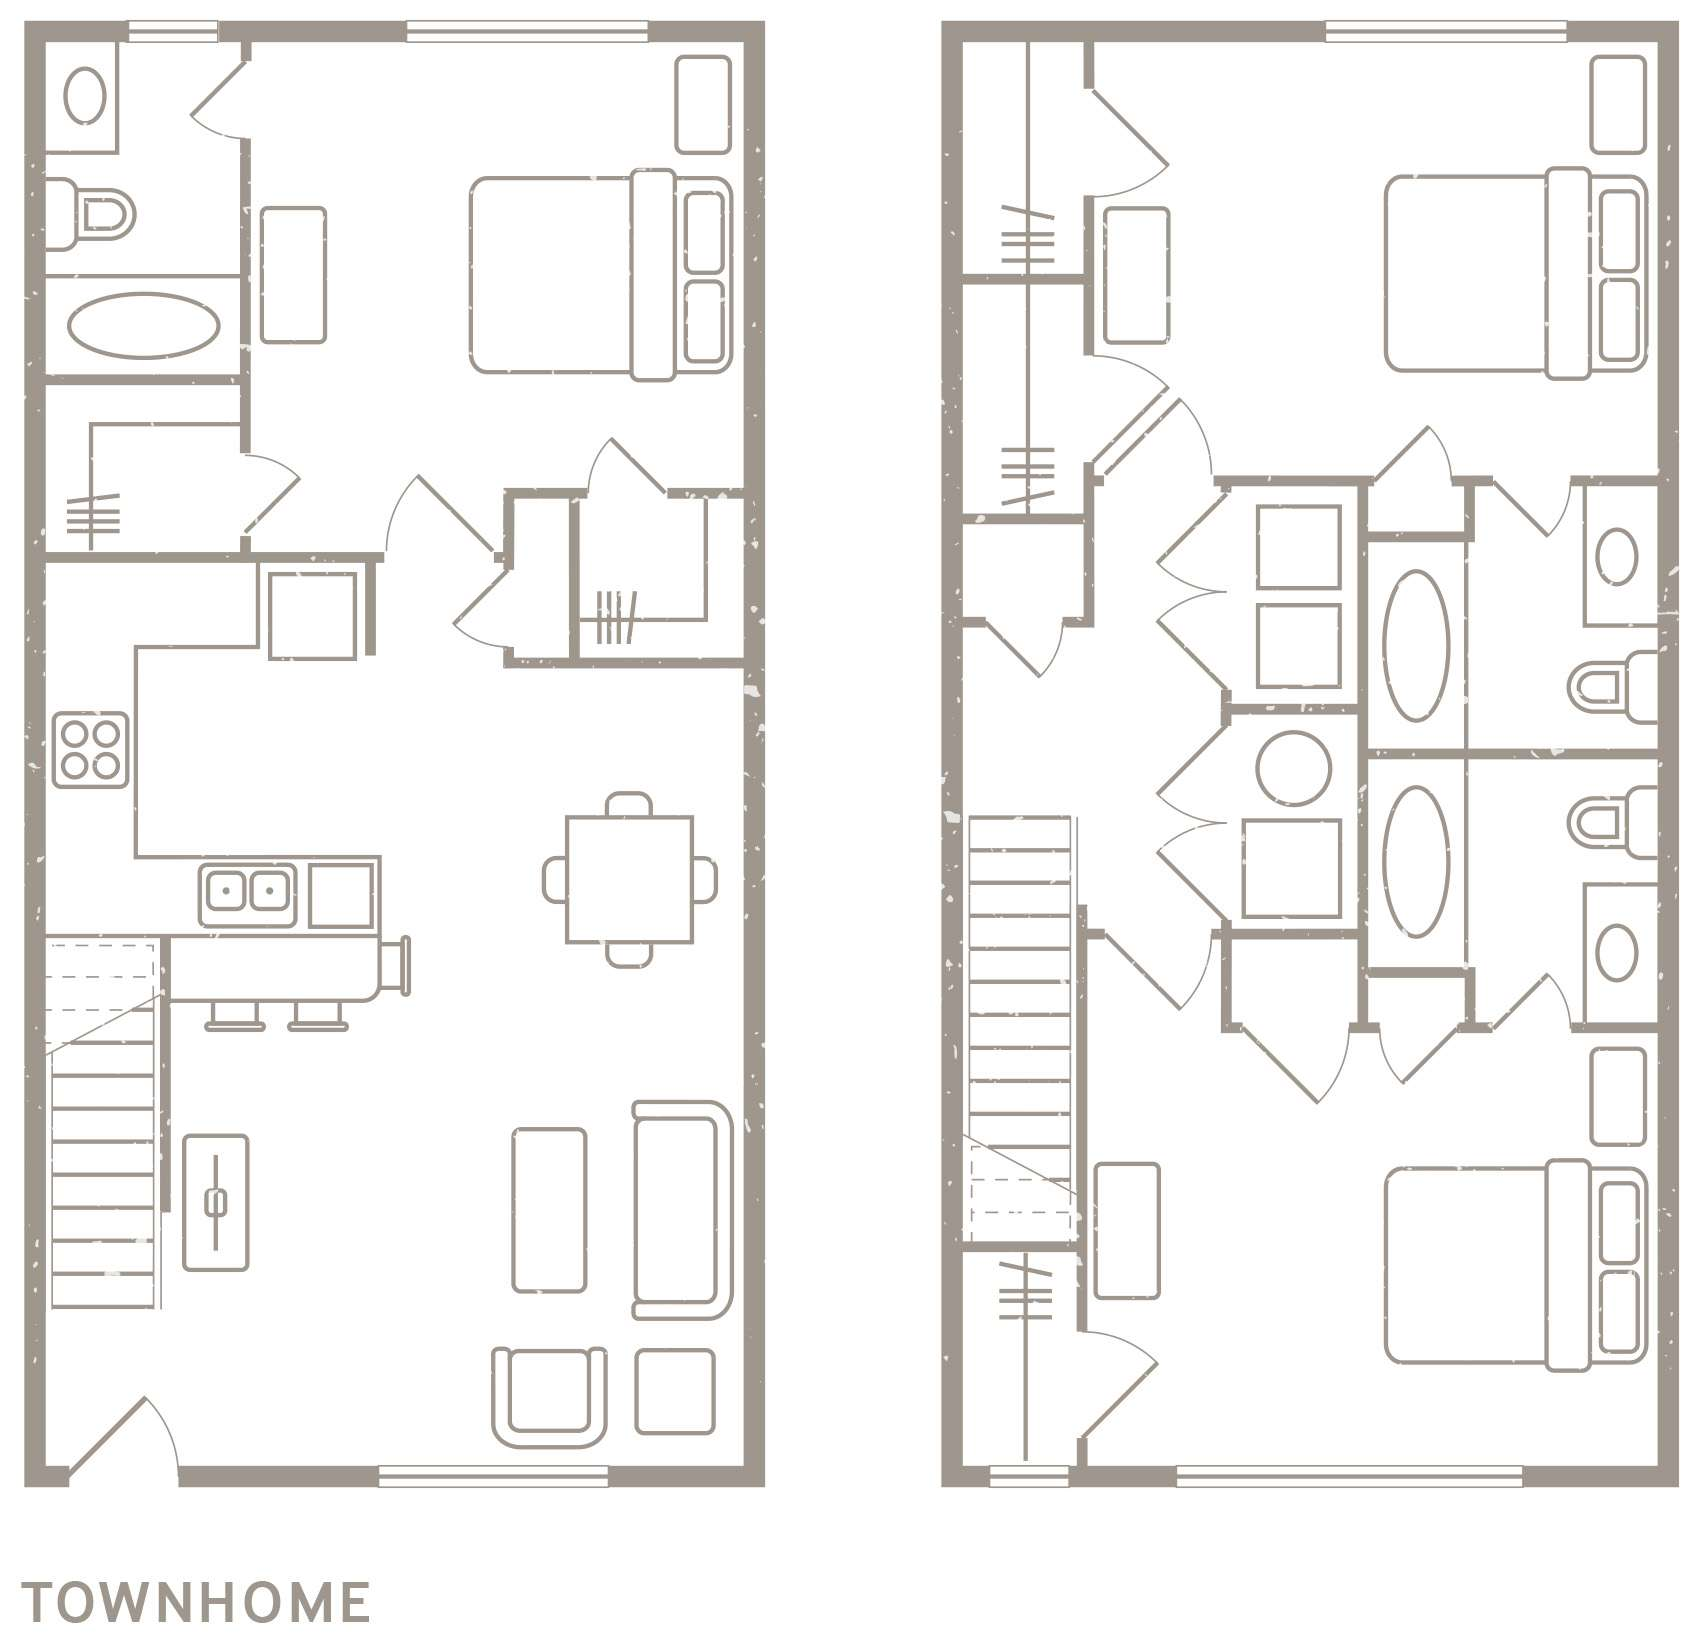 4,3,2 Bedroom Apartment Floorplans